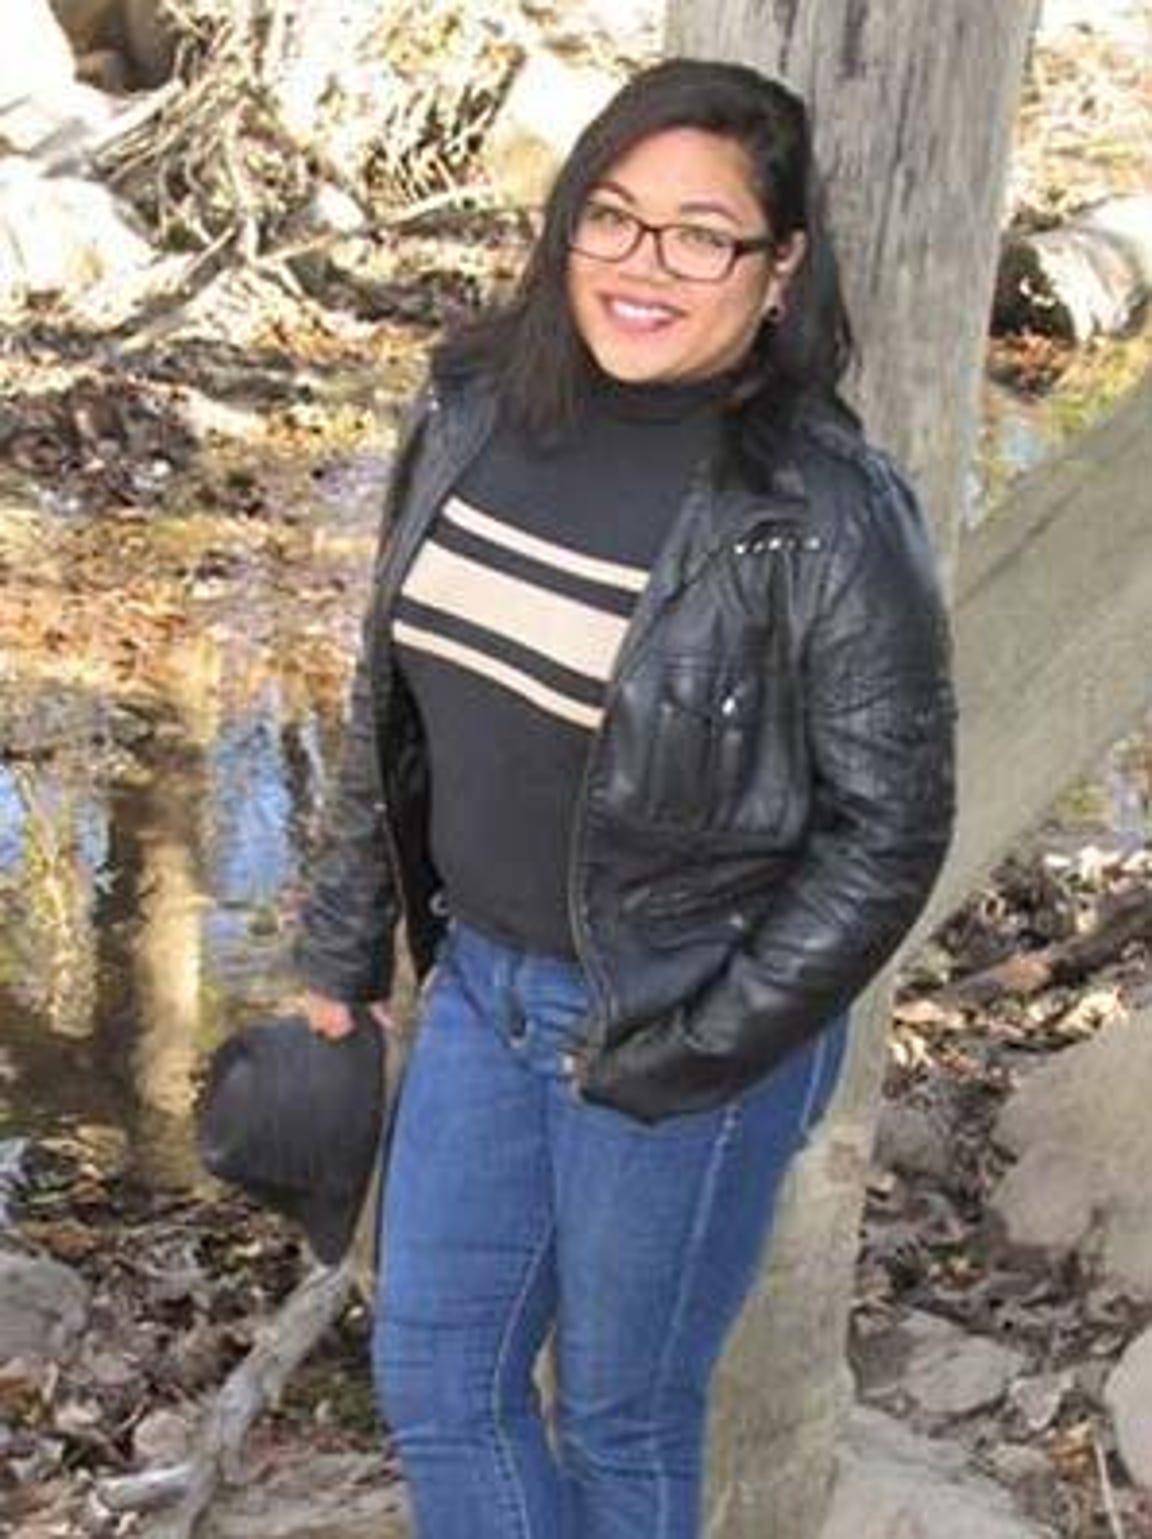 Amira Humes, Saginaw Arts and Sciences Academy